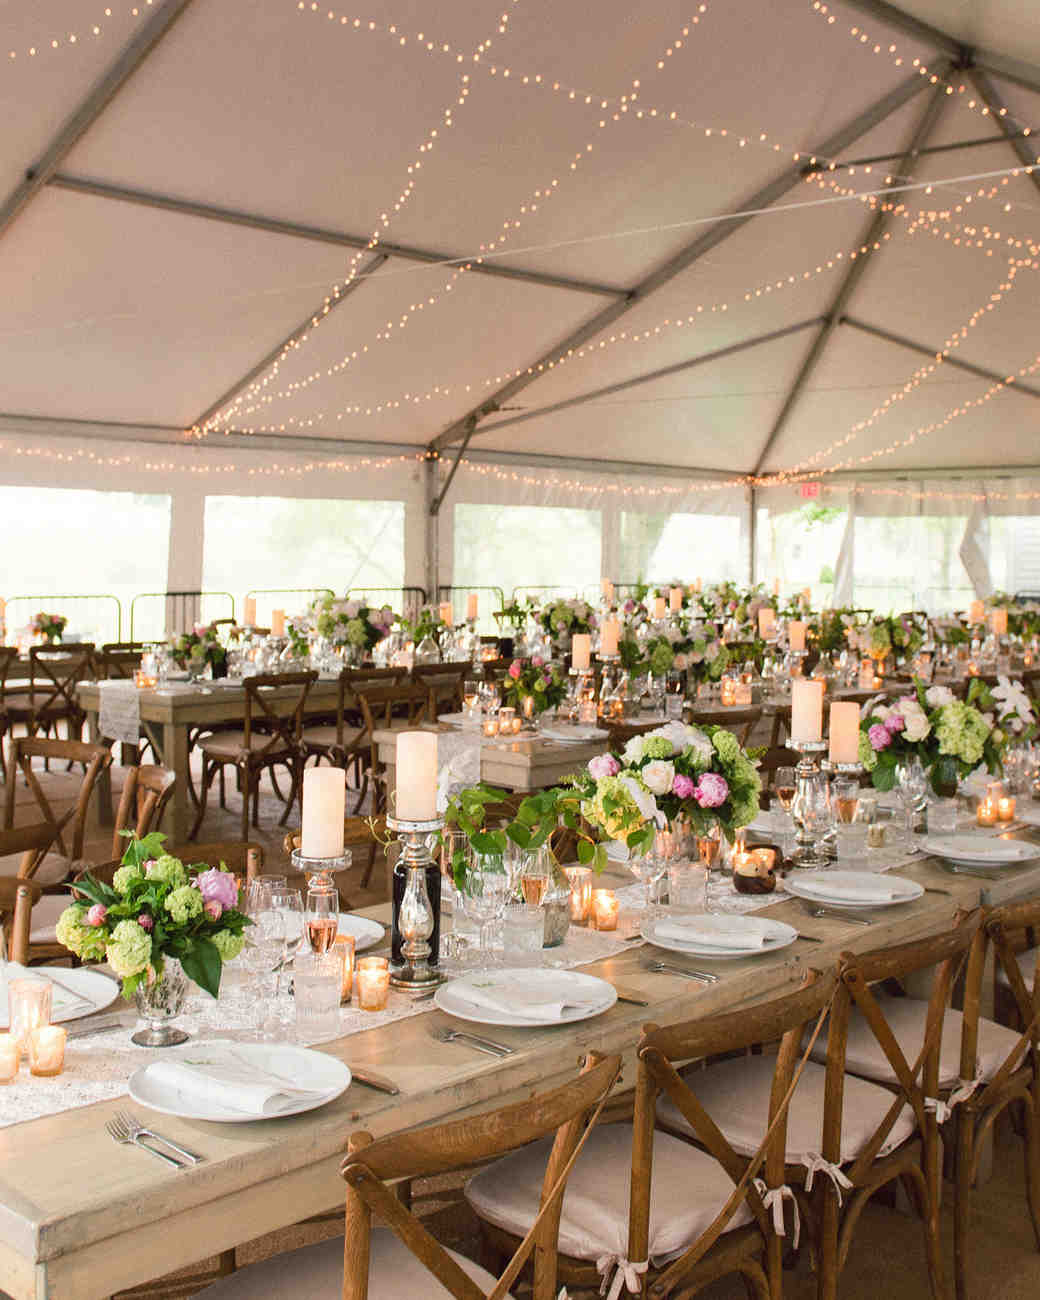 katy andrew wedding reception